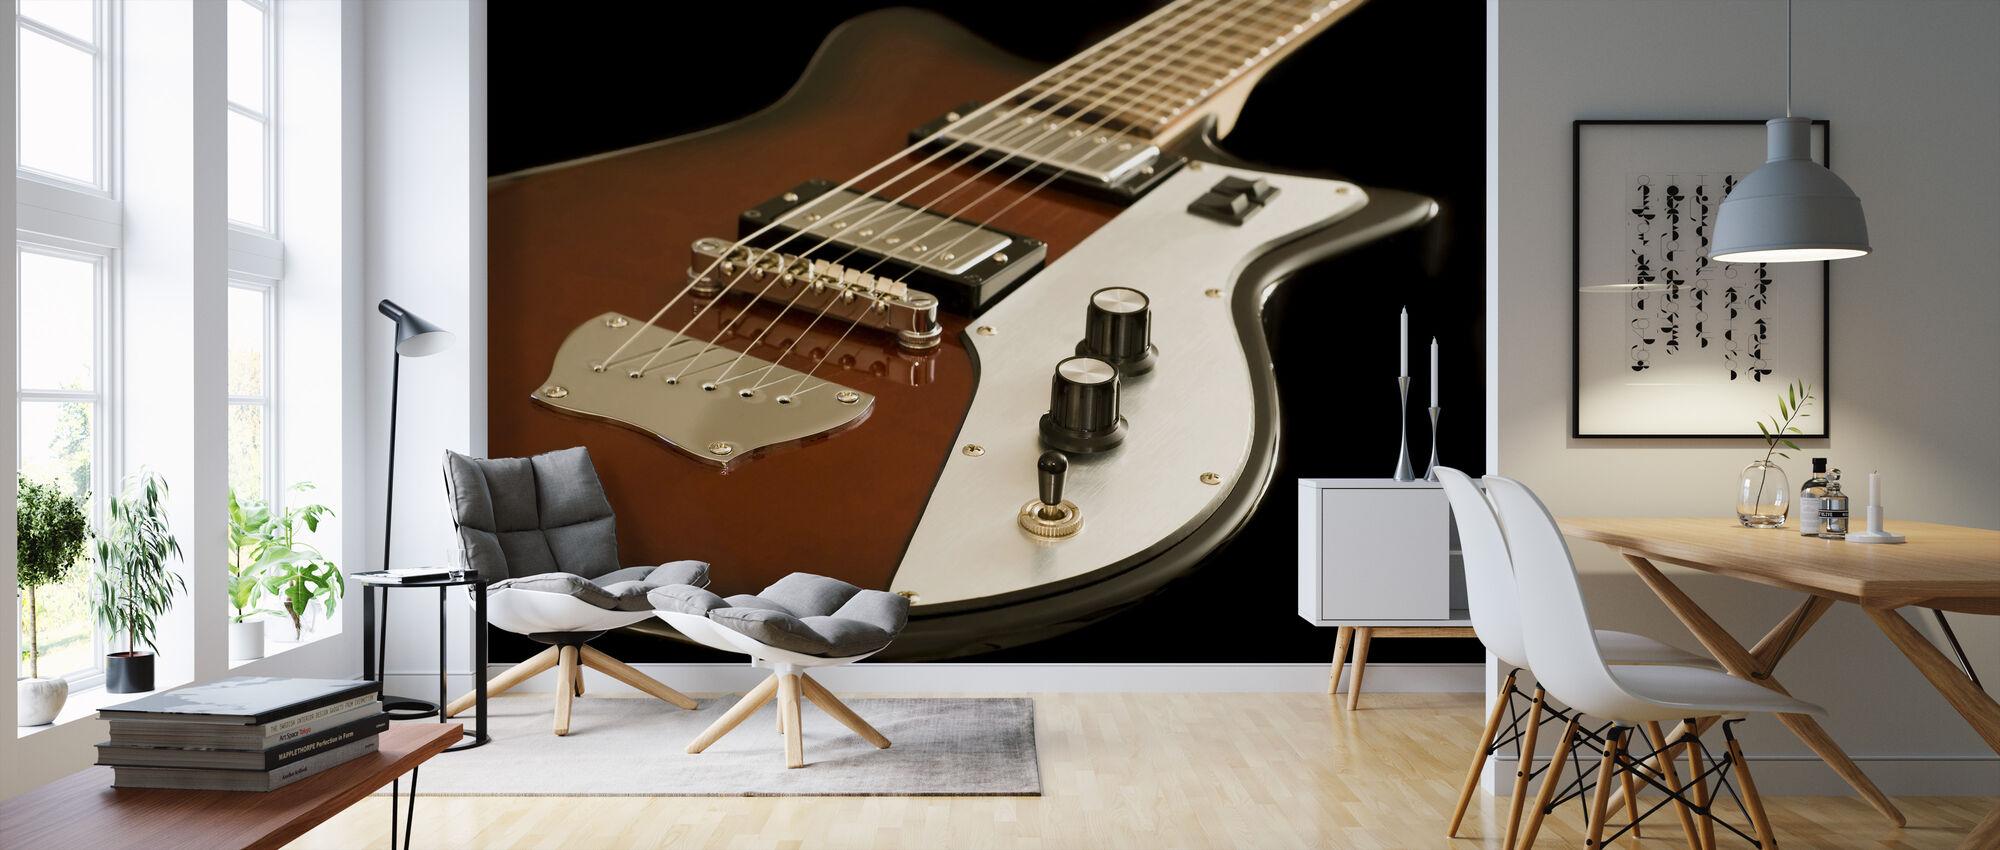 Electric Guitar - Wallpaper - Living Room